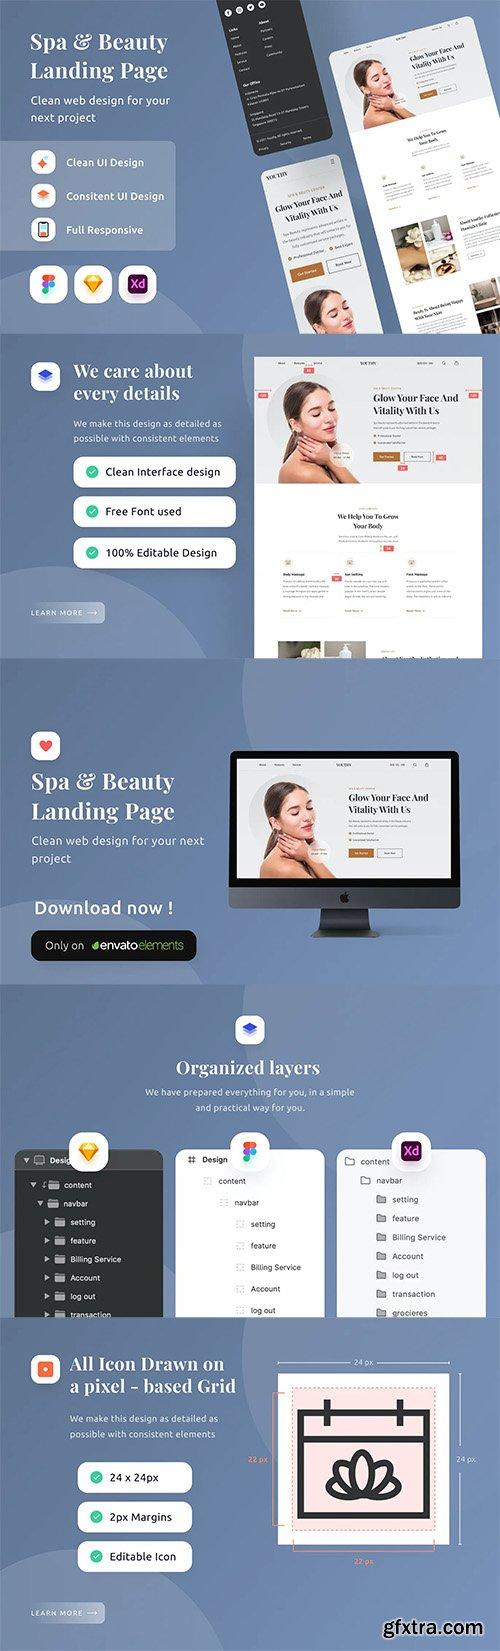 Spa & Beauty Landing Page